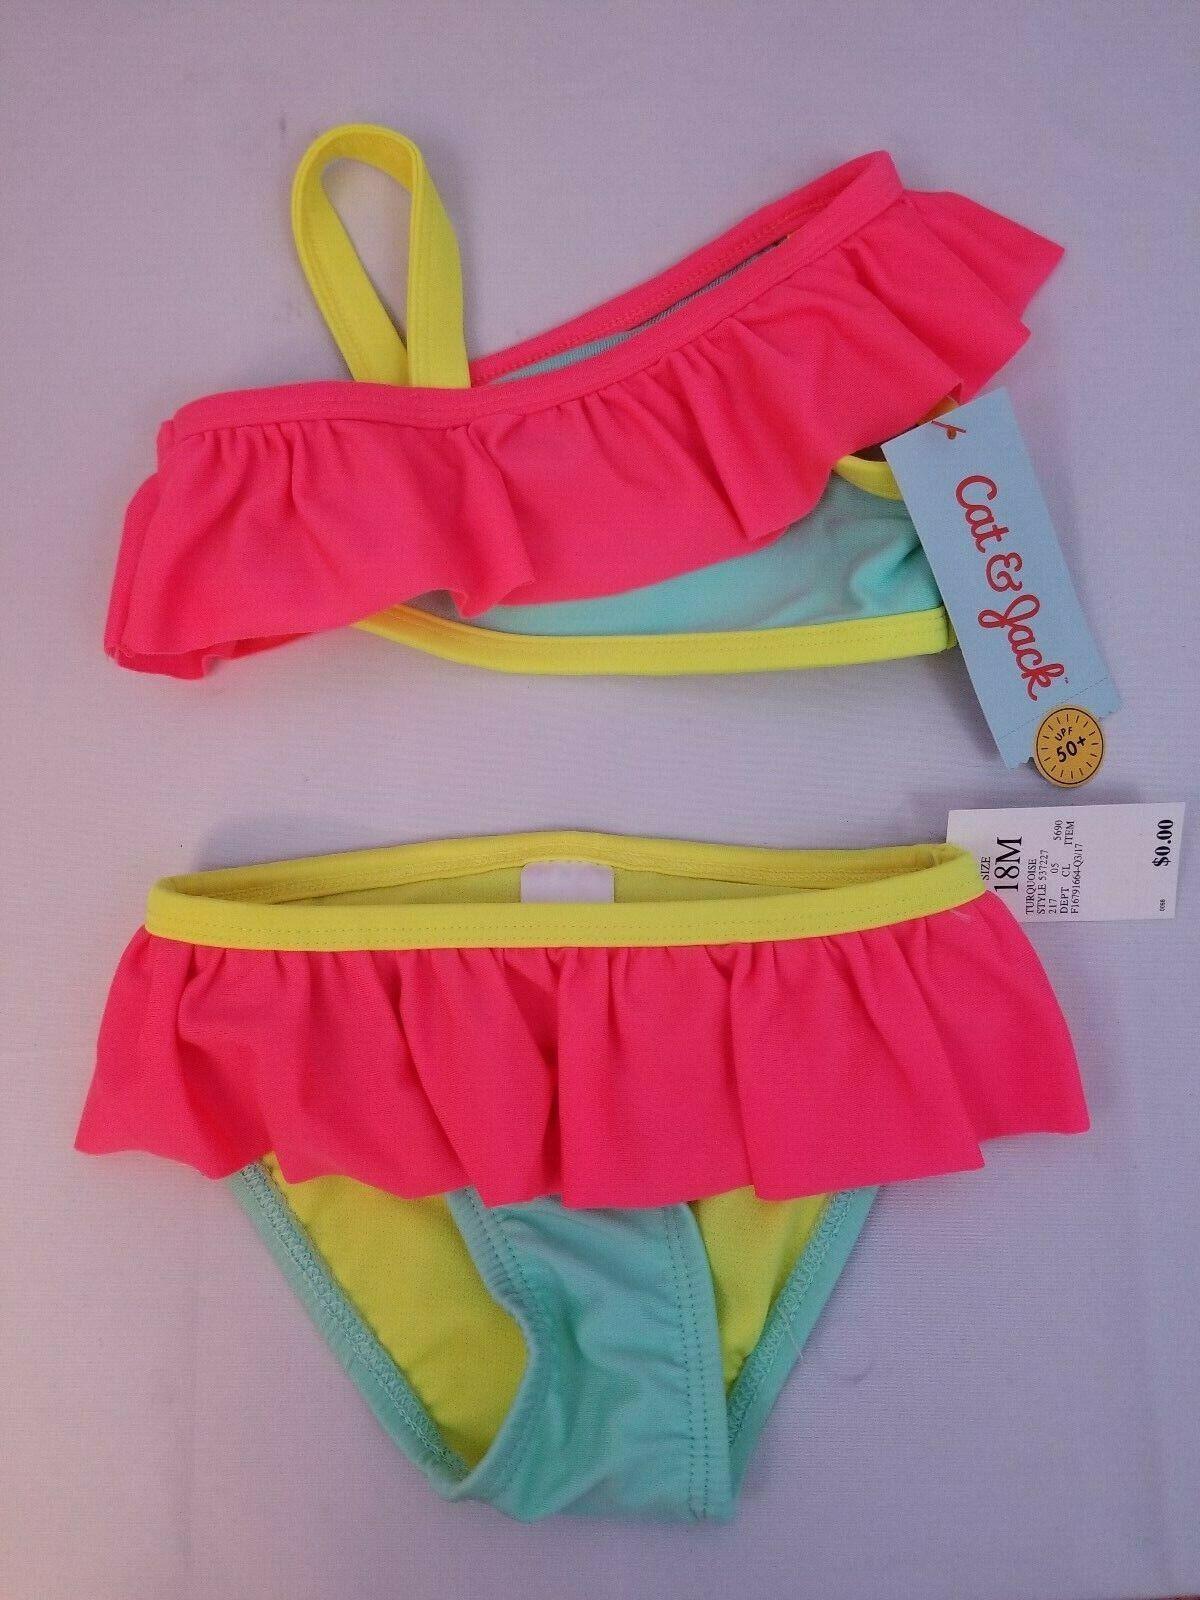 Cat & Jack Baby Girls' Ruffle Bikini Set, 18M, Turquoise - M